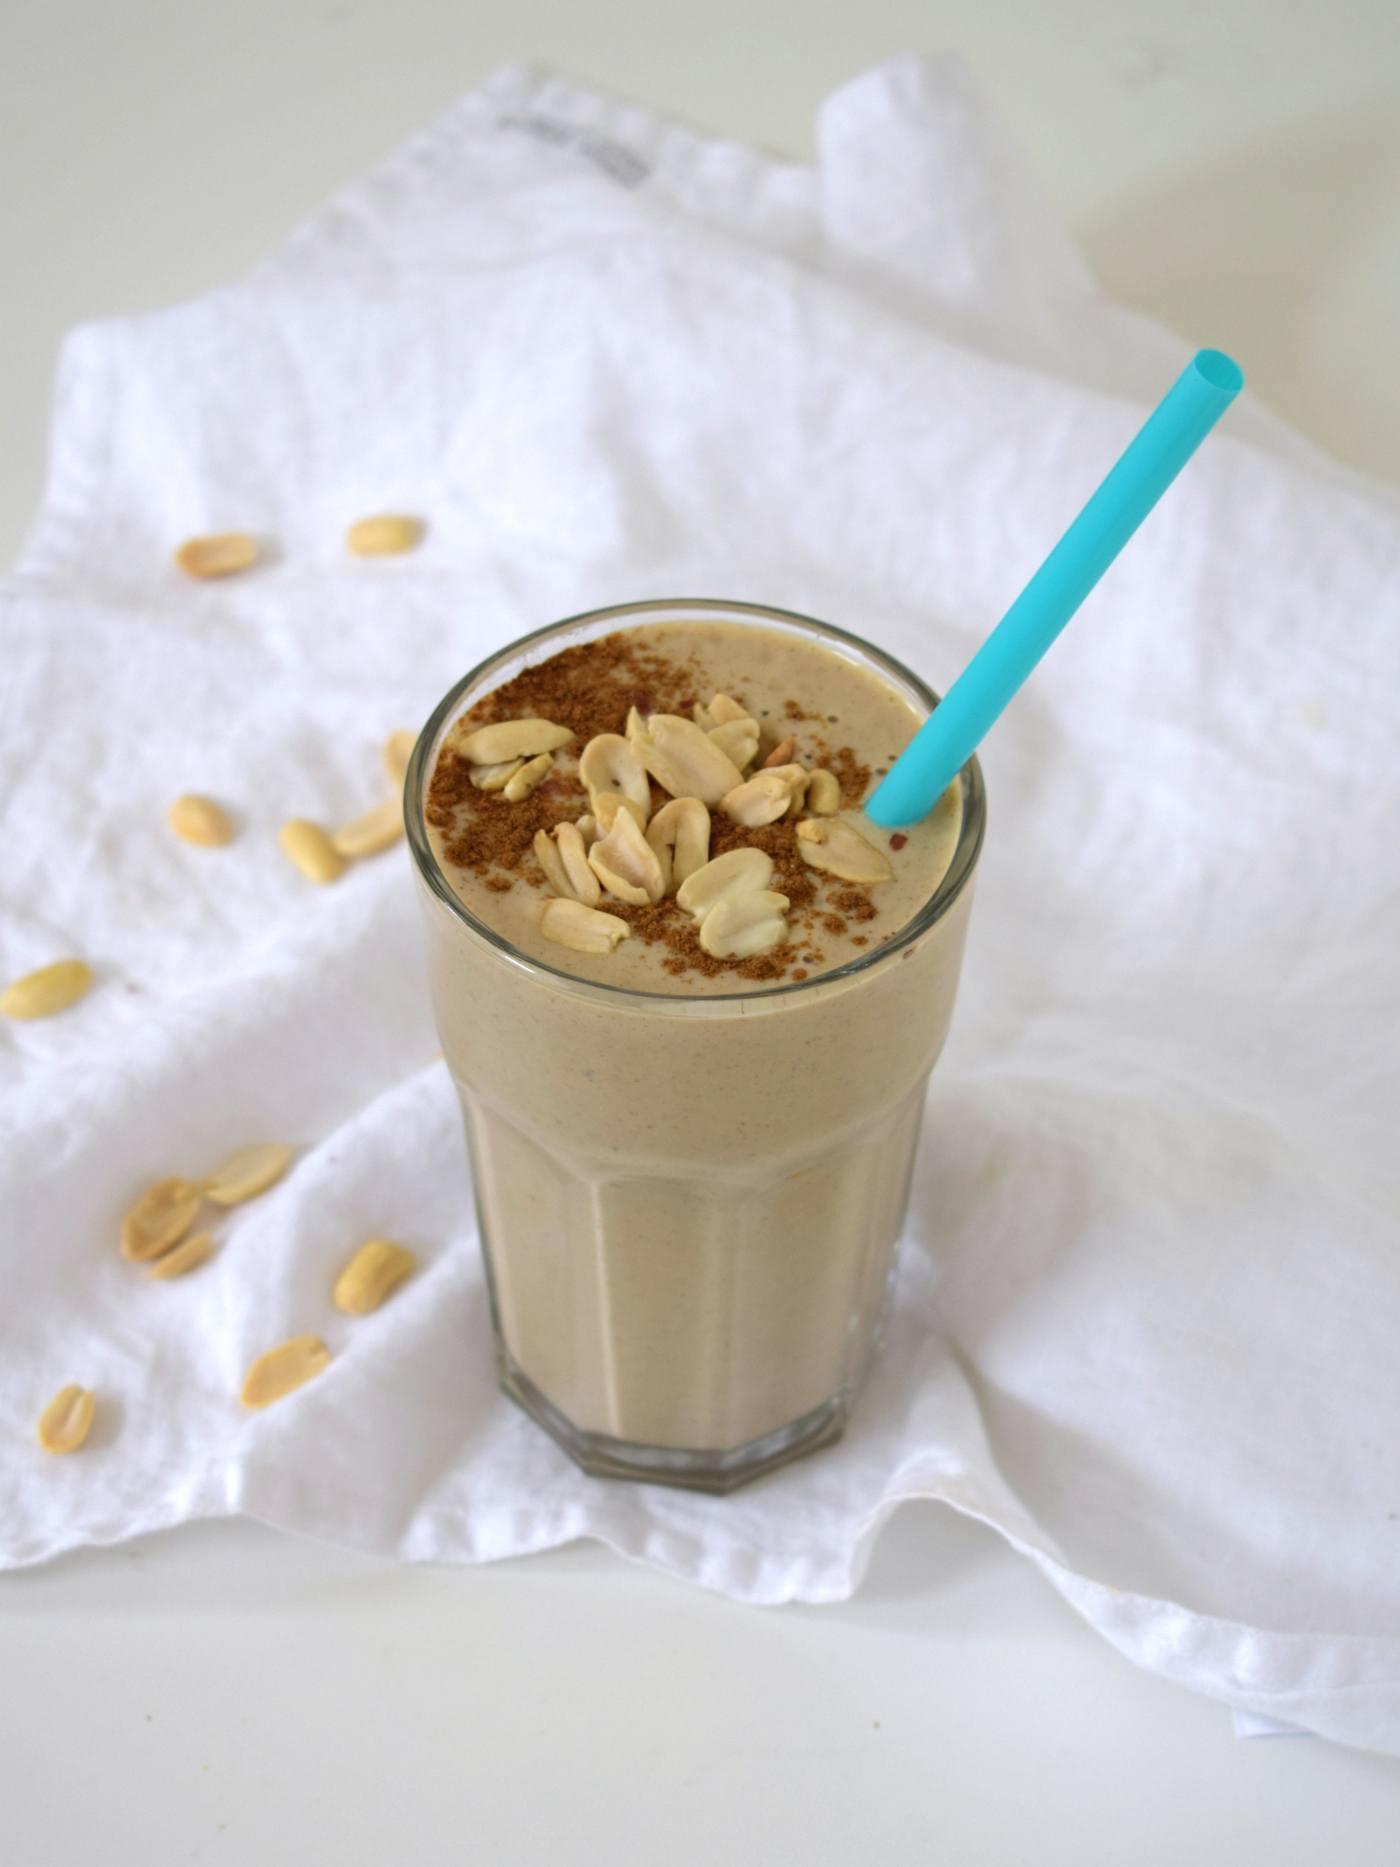 Vegan protein milkshake